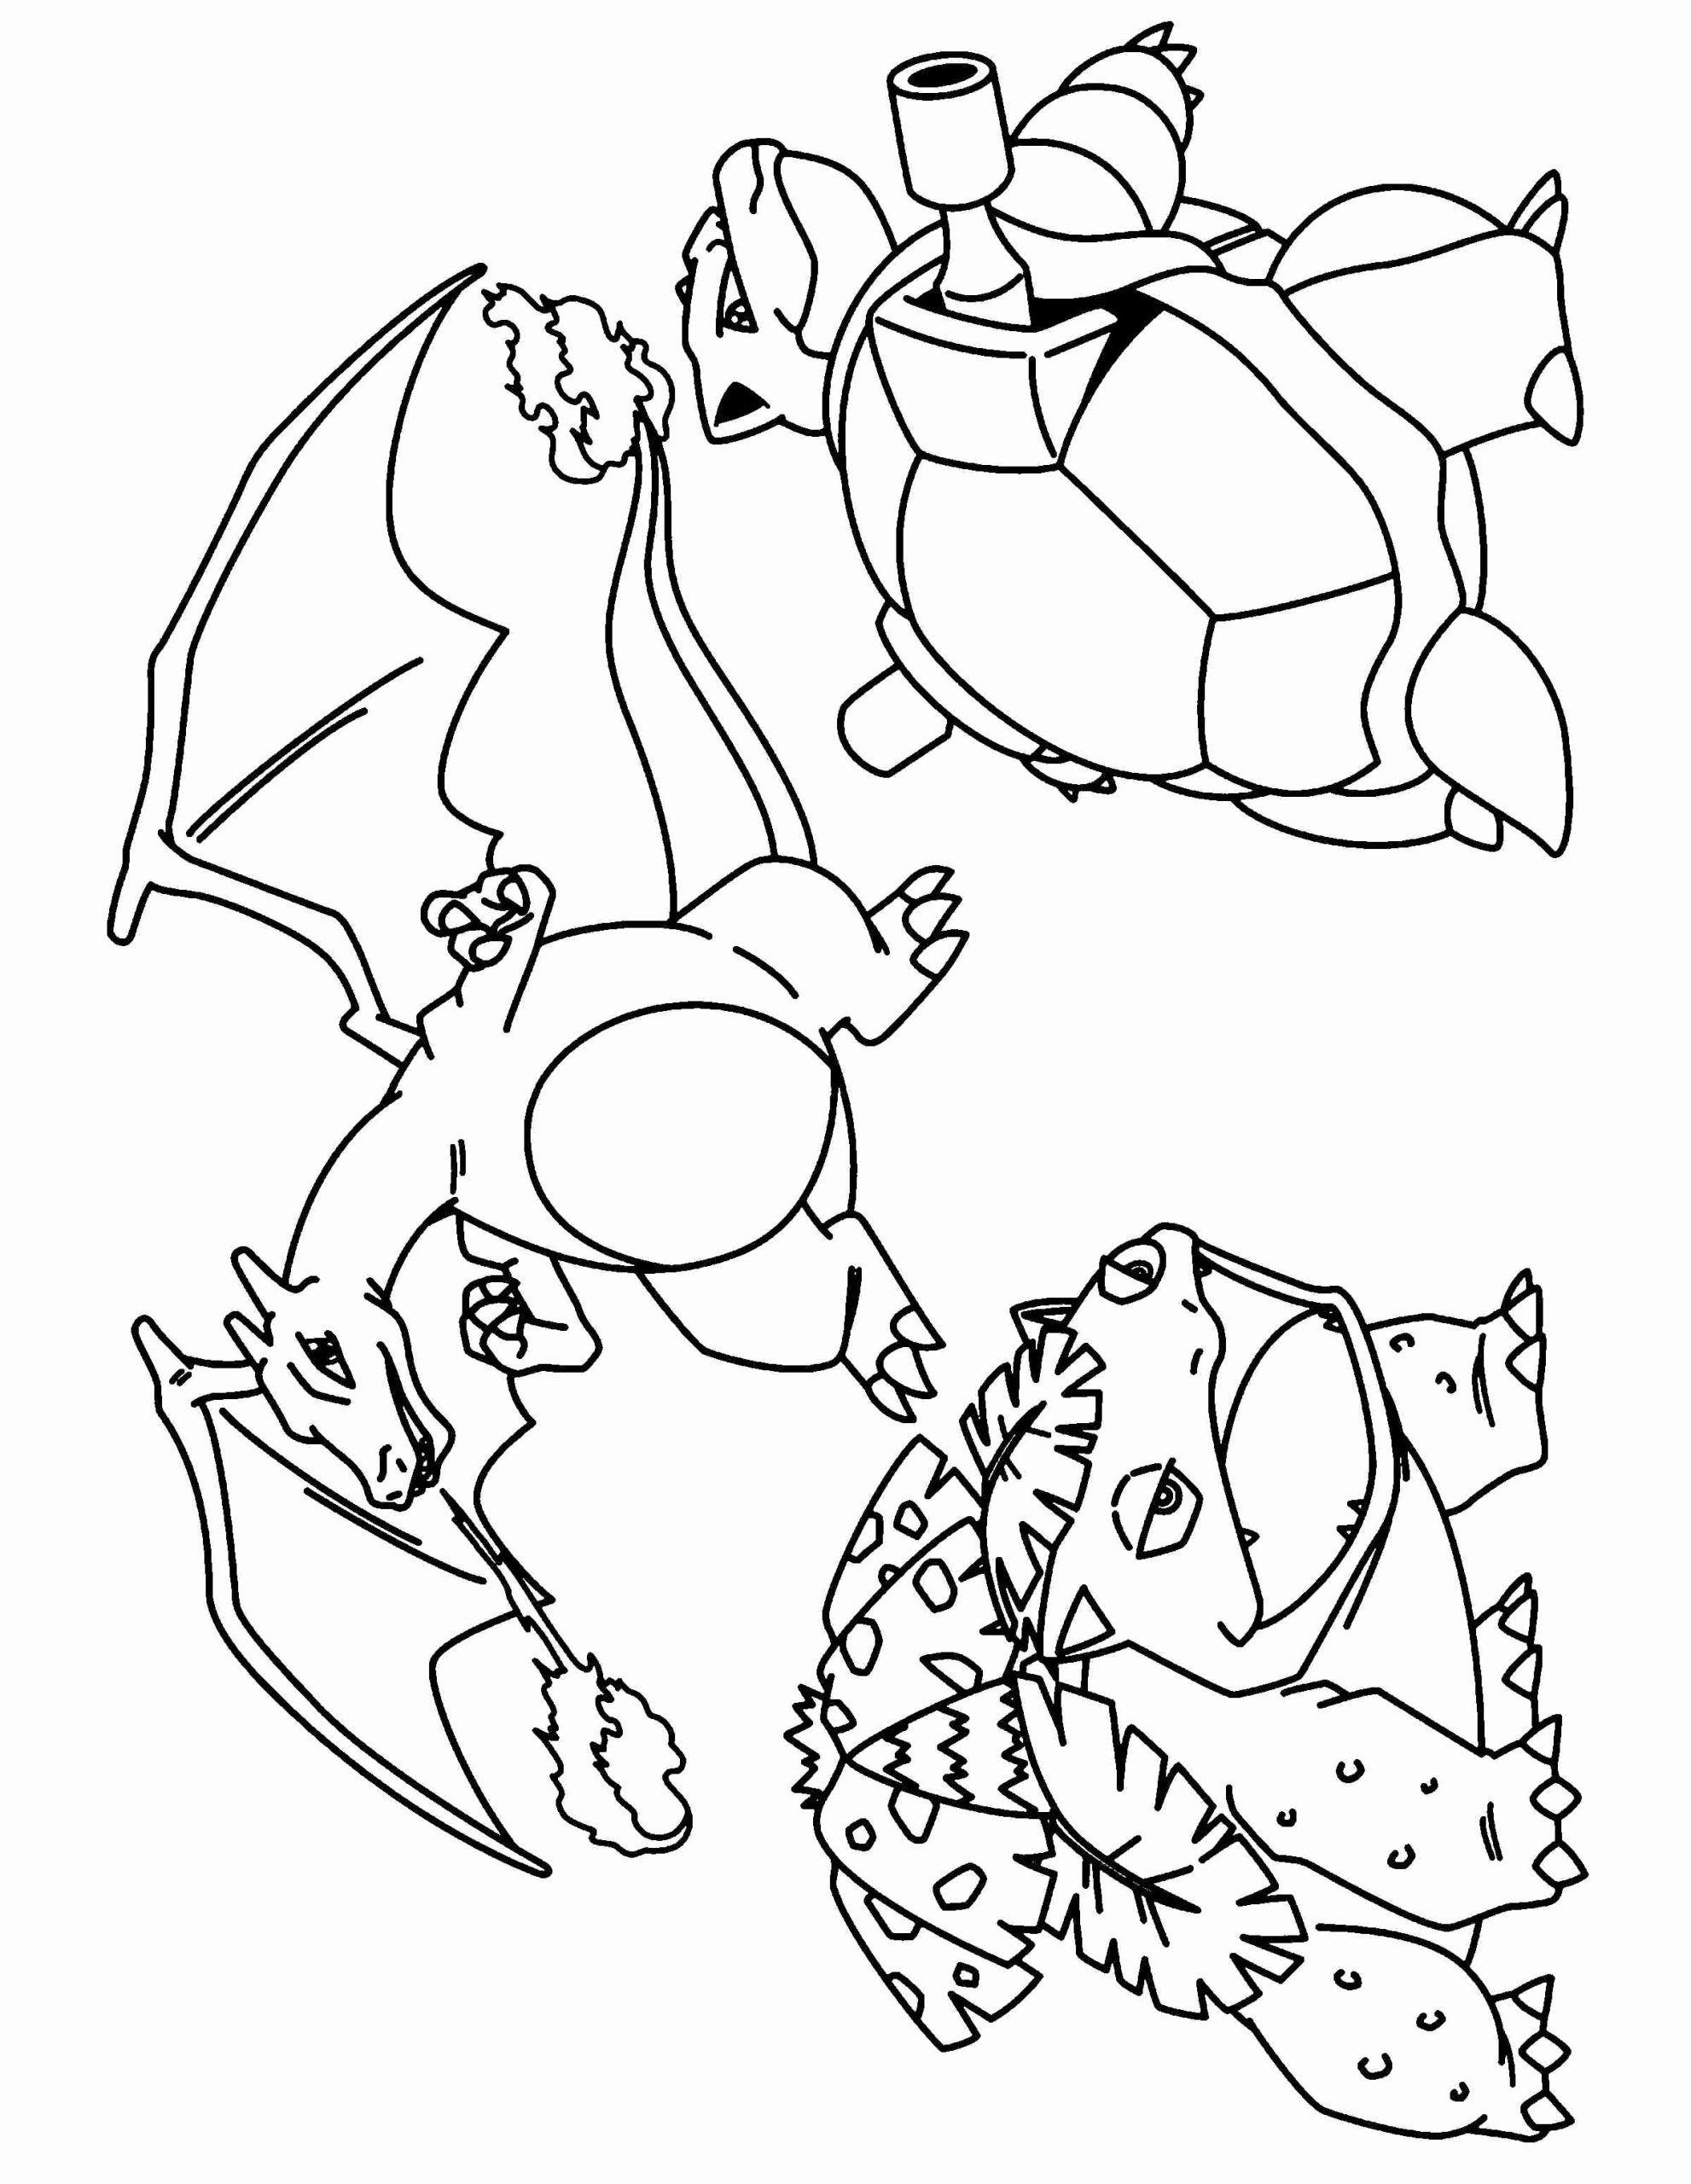 Mega Blastoise Coloring Page Elegant Pokemon Coloring Pages Venusaur In 2020 Pokemon Coloring Pages Pokemon Coloring Pokemon Coloring Sheets